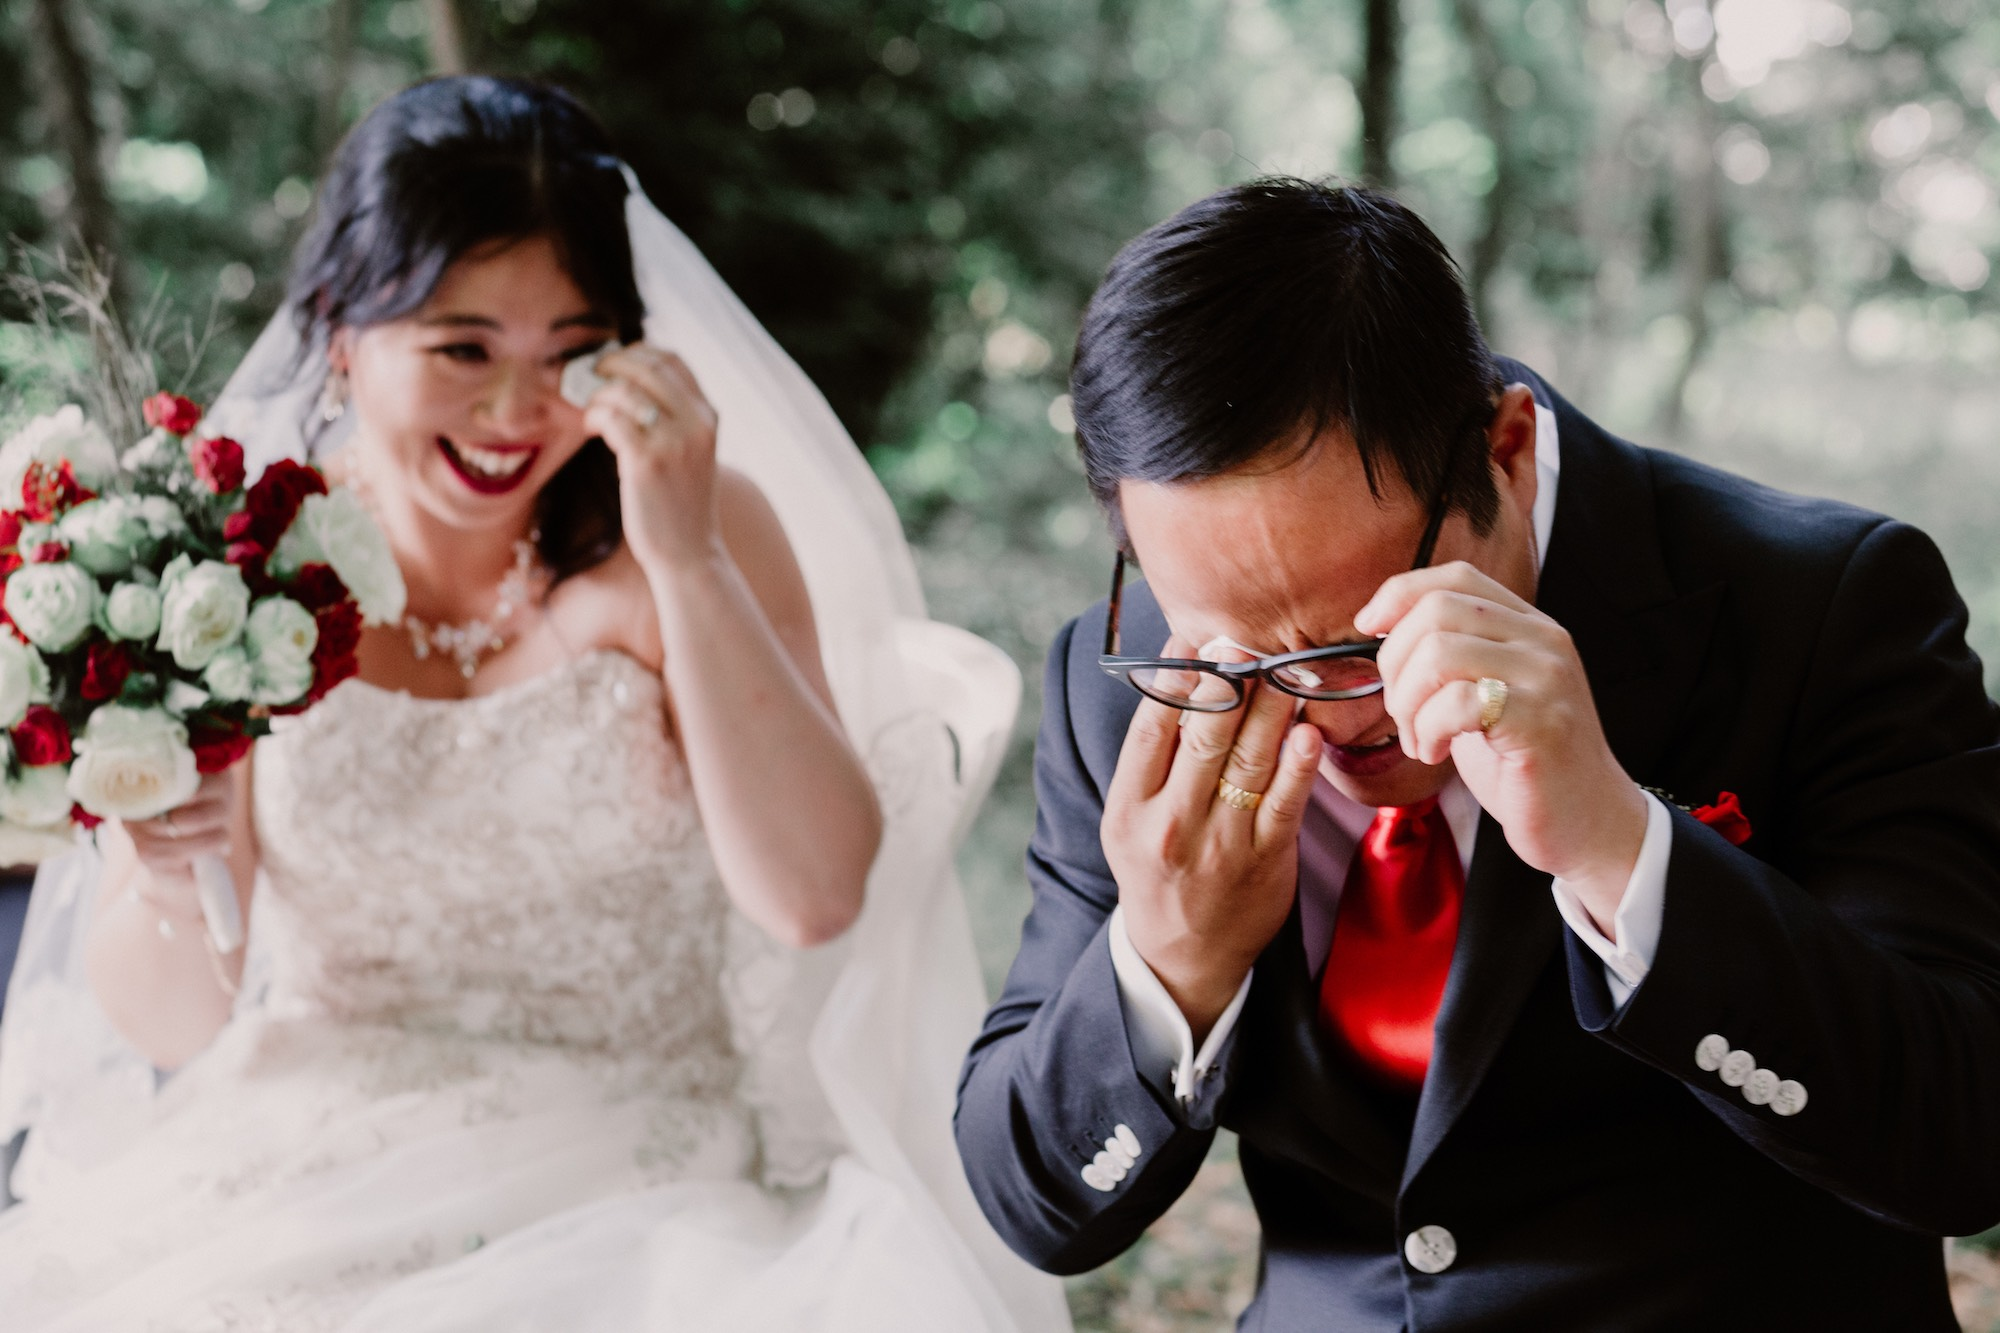 HD Mariage Yiang Philippe 156 - Dagmara Bojenko - Eco-conscious Weddings, Births & Families